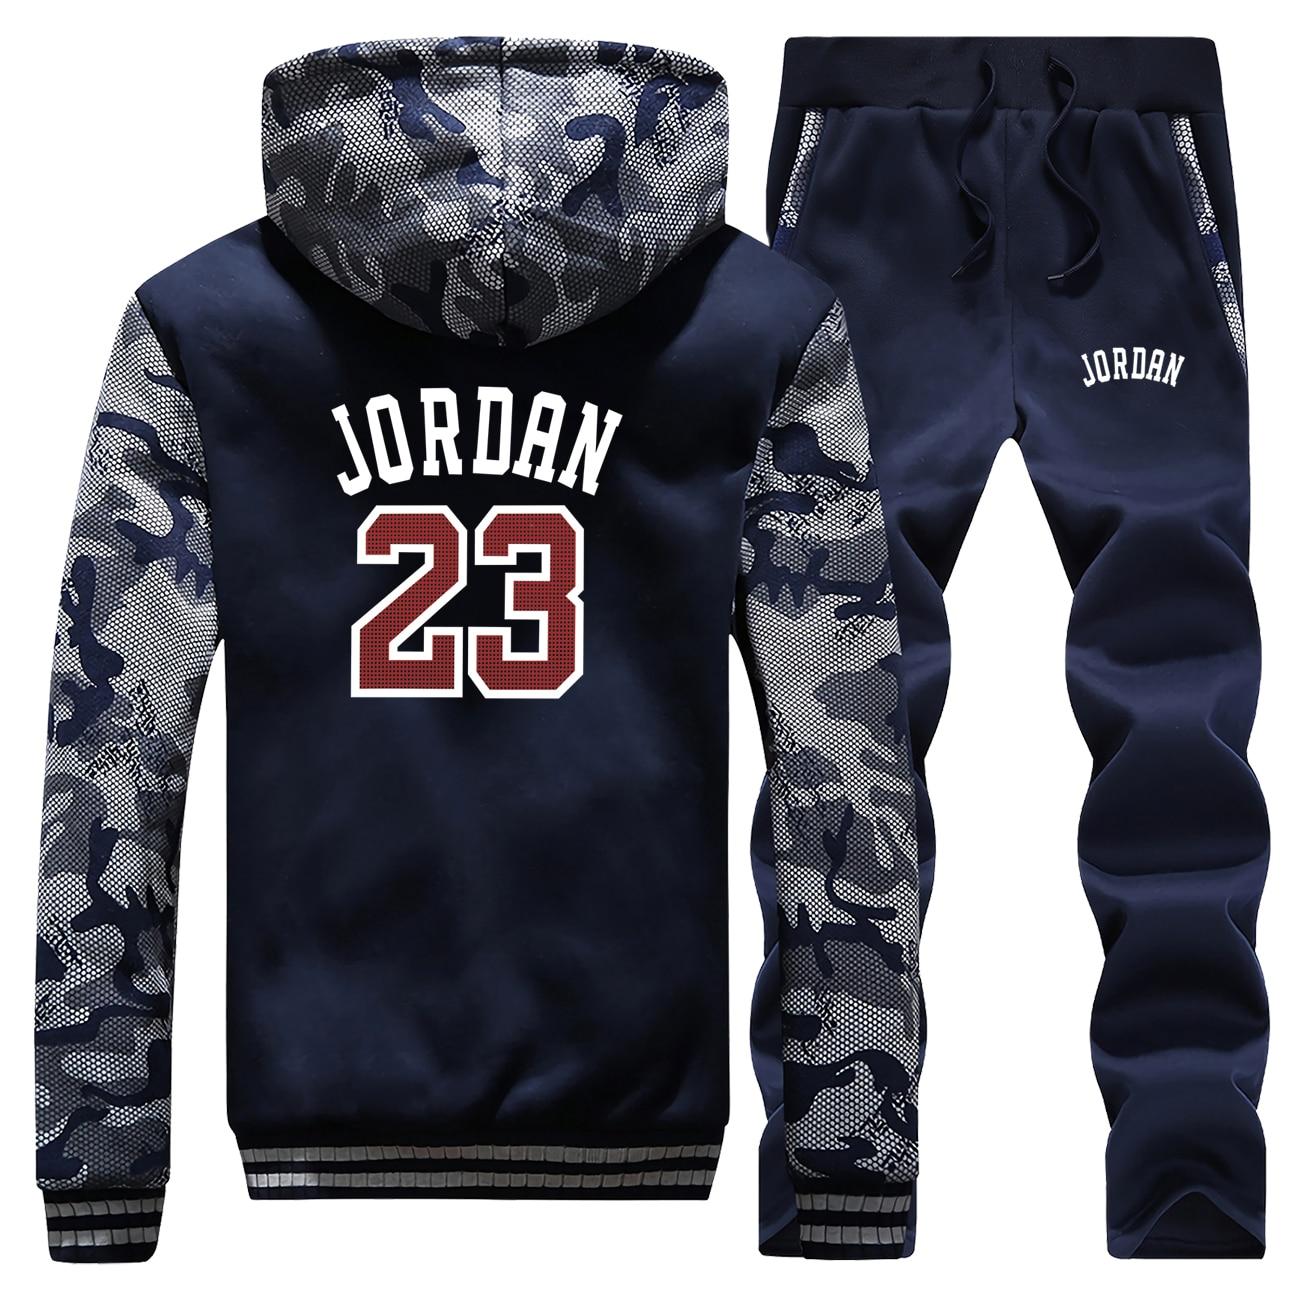 Jordan 23 Mens Tracksuit Set Hot Sports